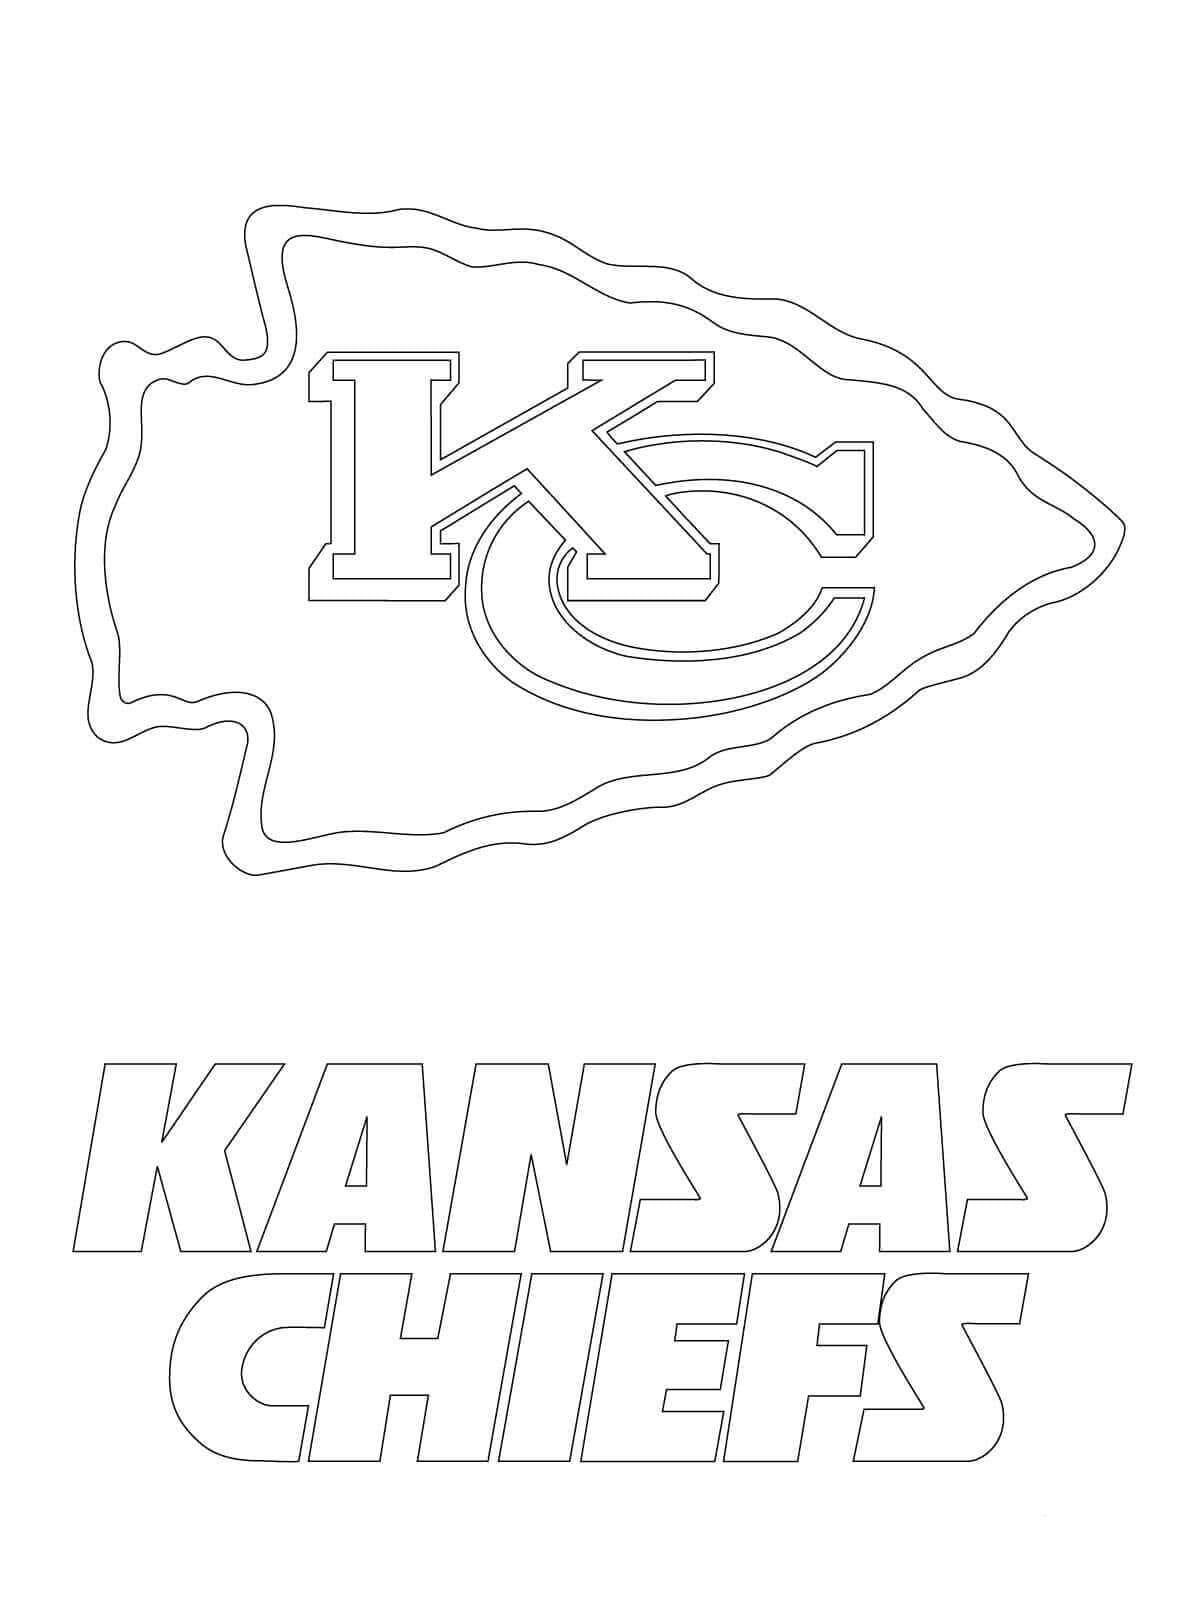 Kansas City Chief Coloring Page